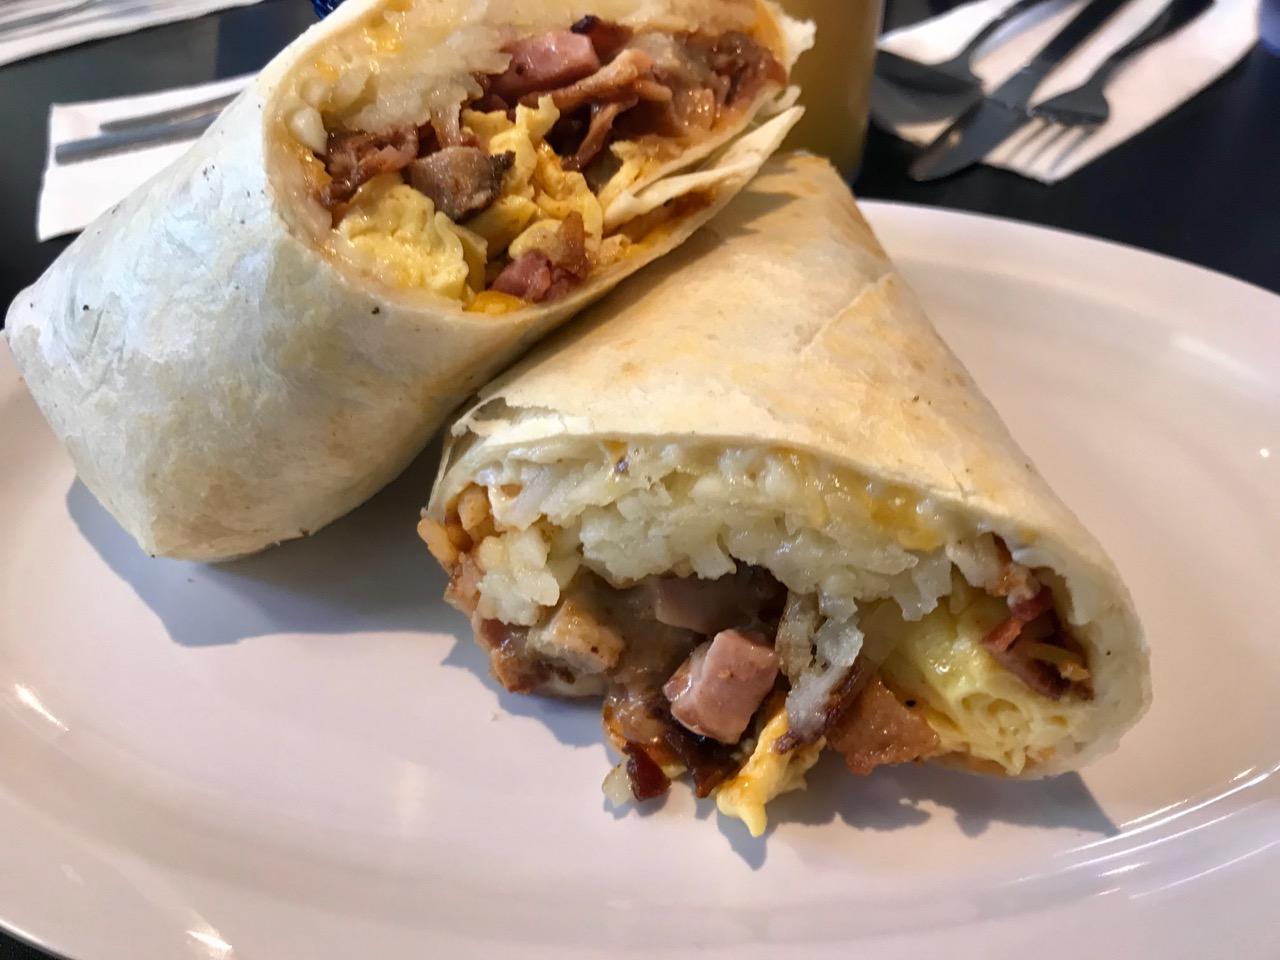 One Helluva Breakfast Burrito at Just Joel's – January 13 2018